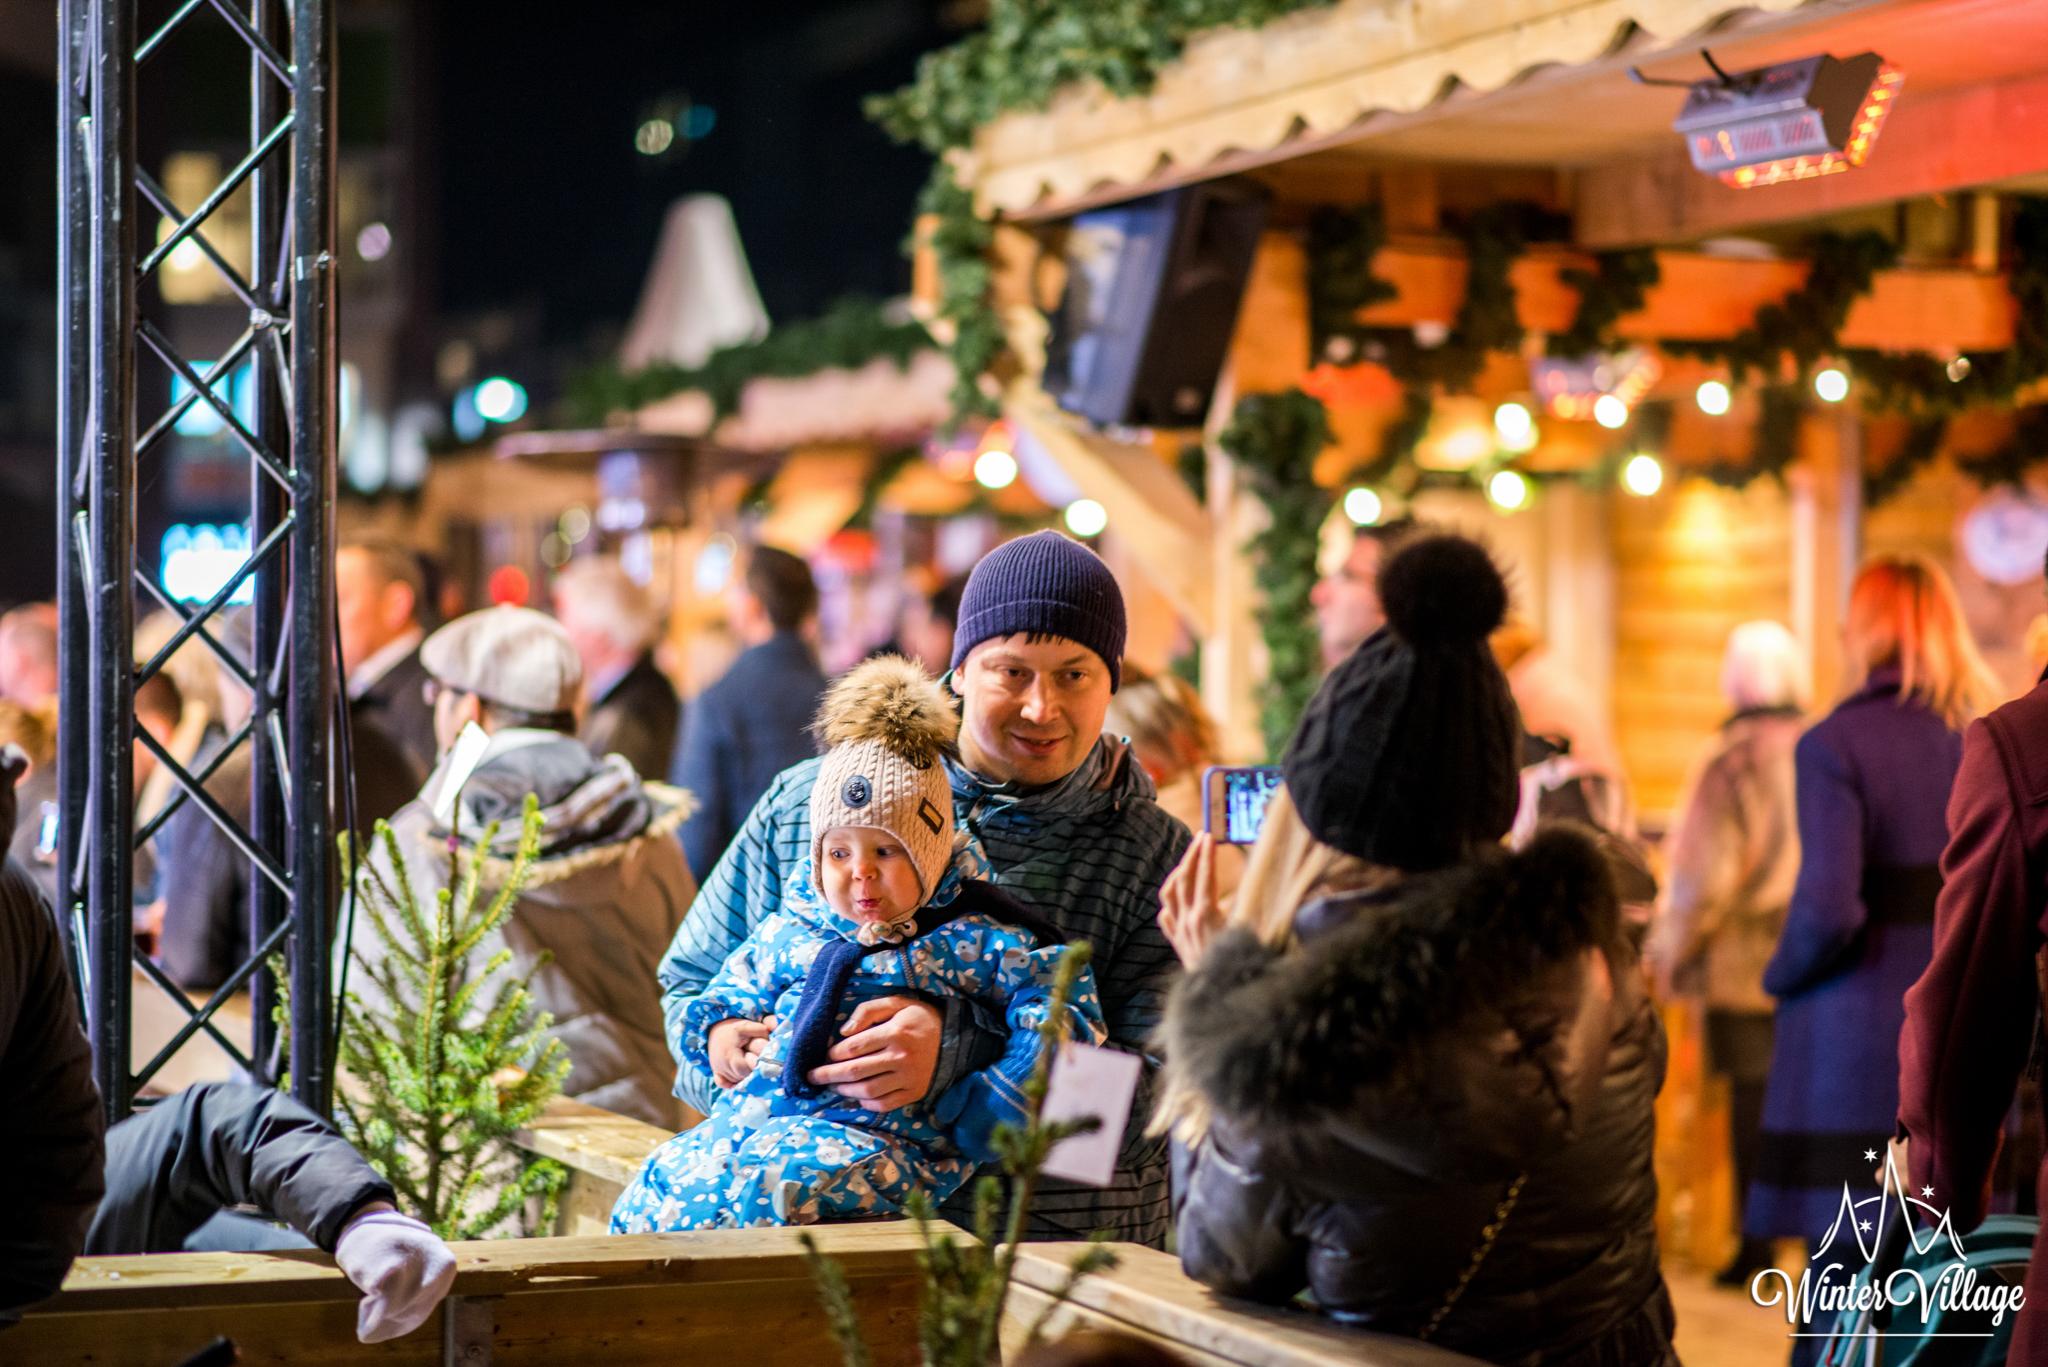 Winter Village Amstelveen publiek